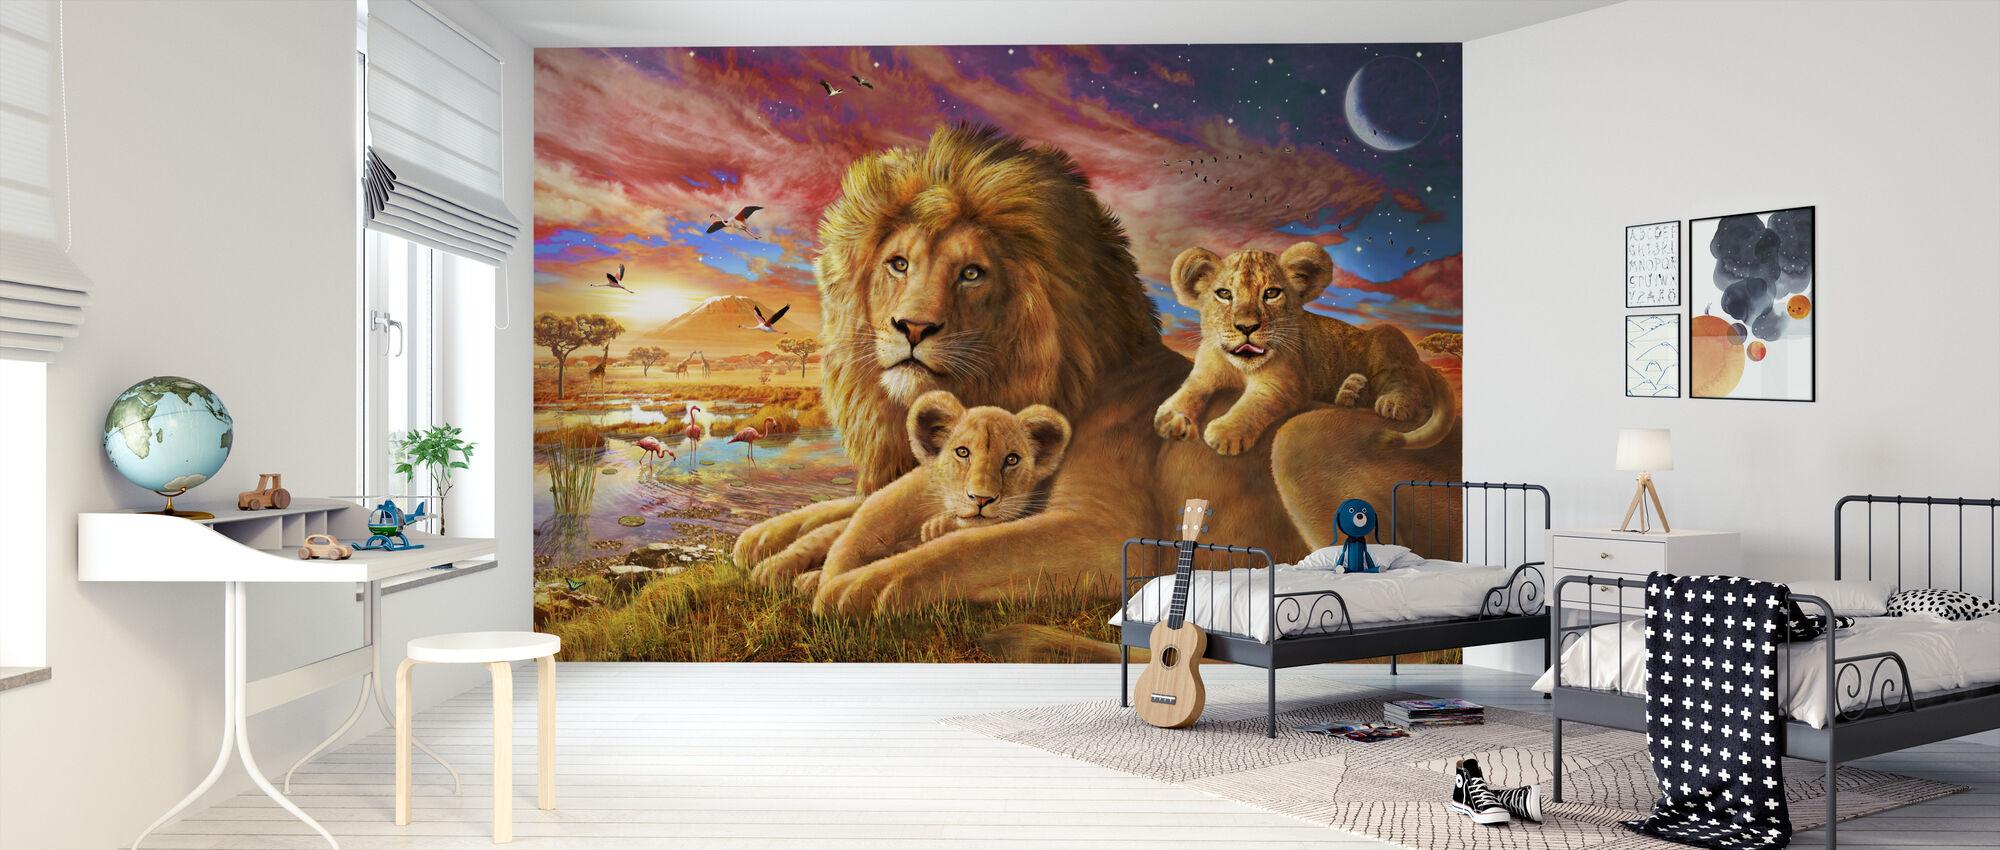 Lejonsoluppgång - Tapet - Barnrum